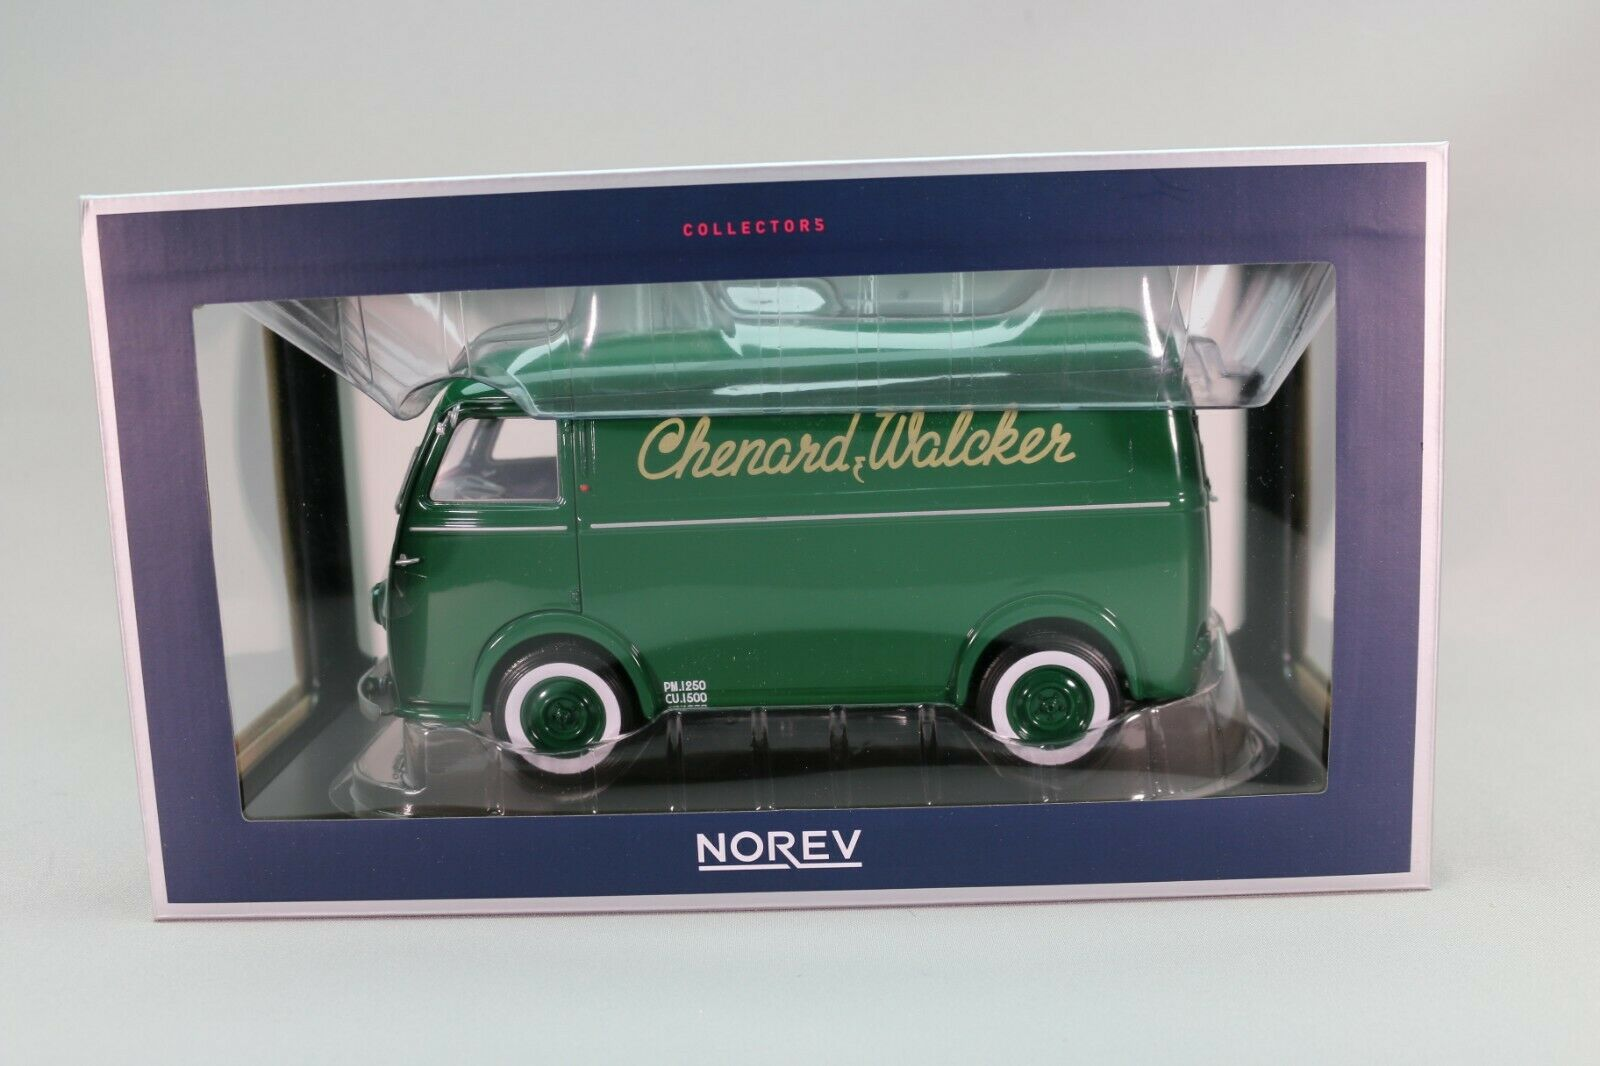 ZE035 NOREV 184698 Voiture 1 18 Chenard & Walker CHV métal verde très bon état